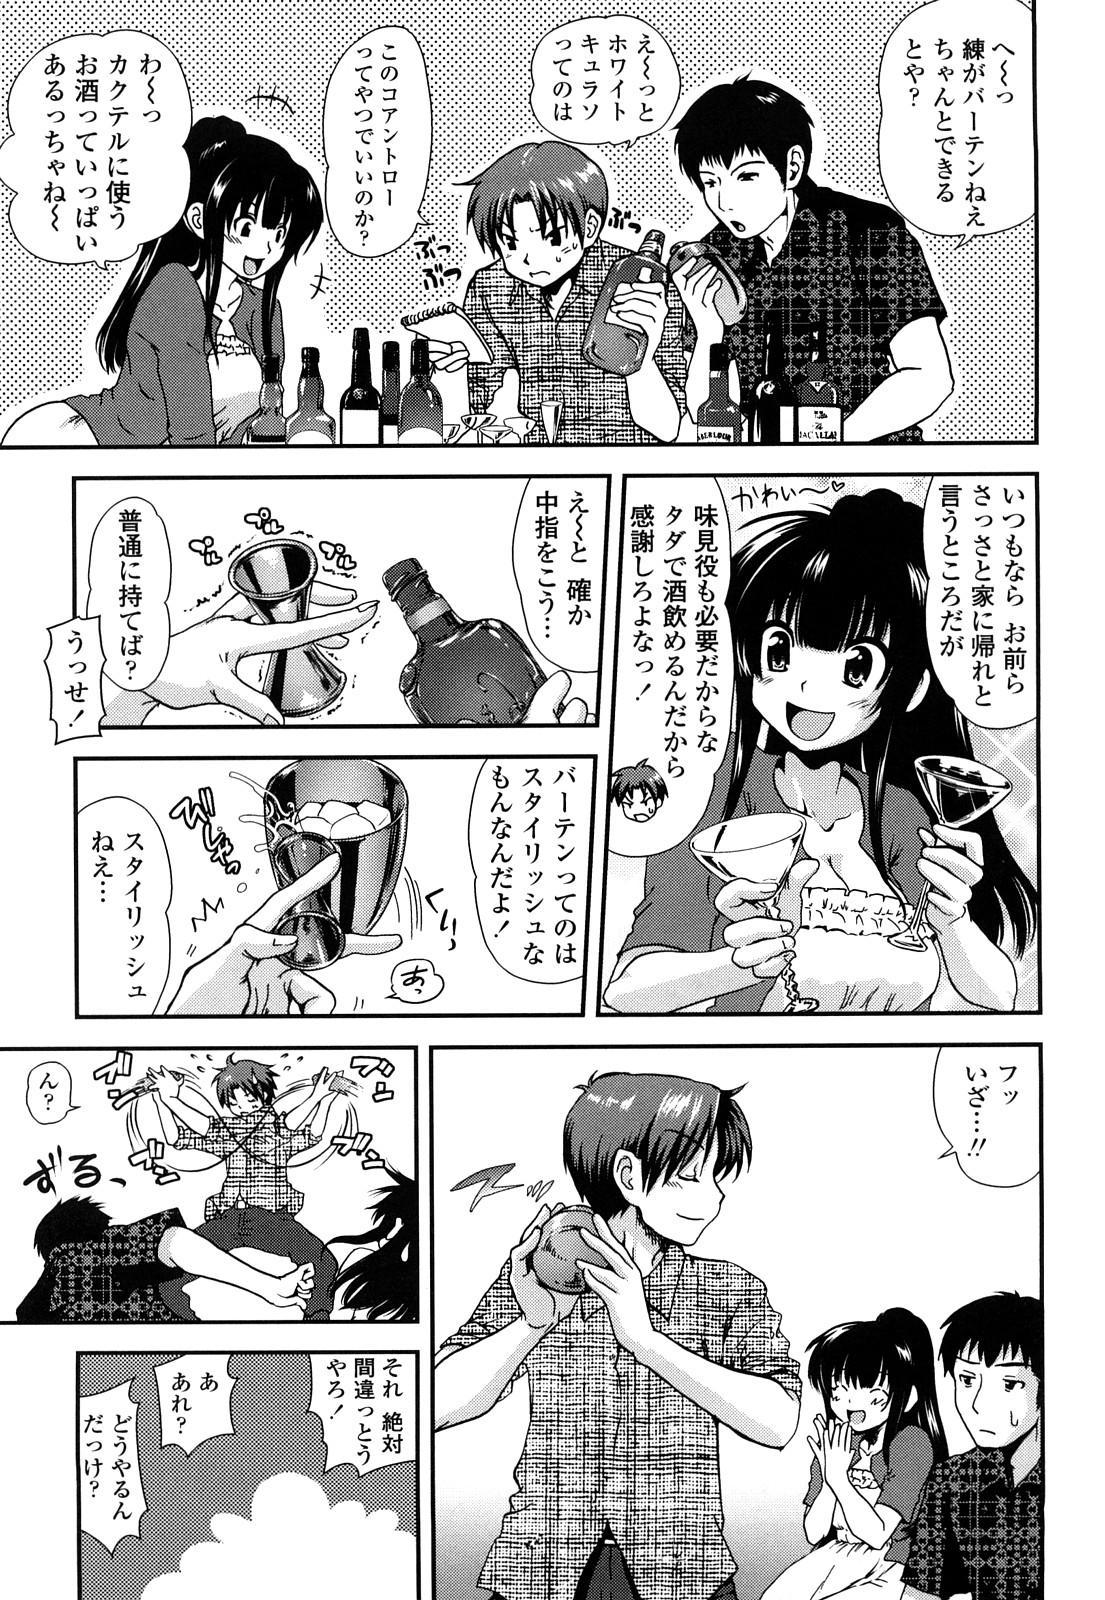 Ichigo Marble 47